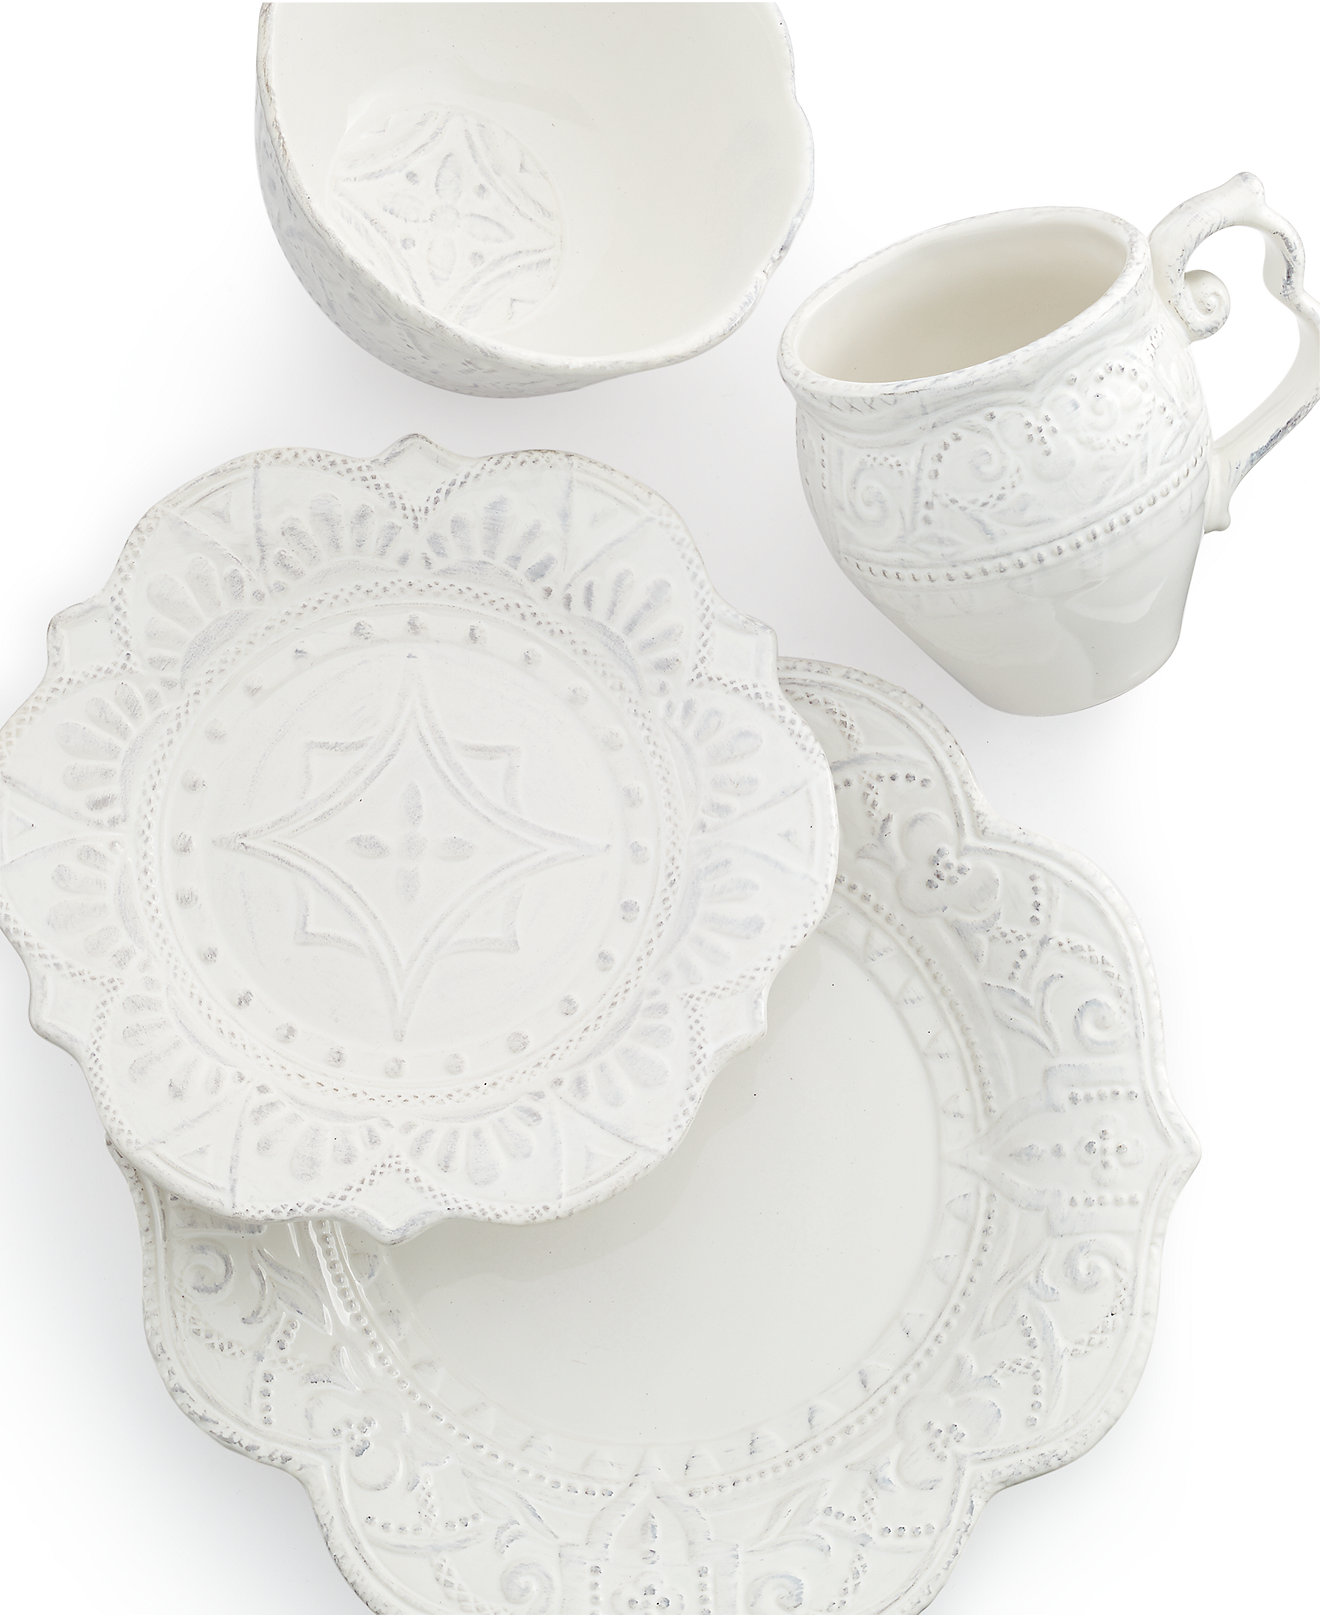 White apron macy's - Maison Versailles Blanc Amelie Scalloped 4 Piece Place Setting Dinnerware Dining Entertaining